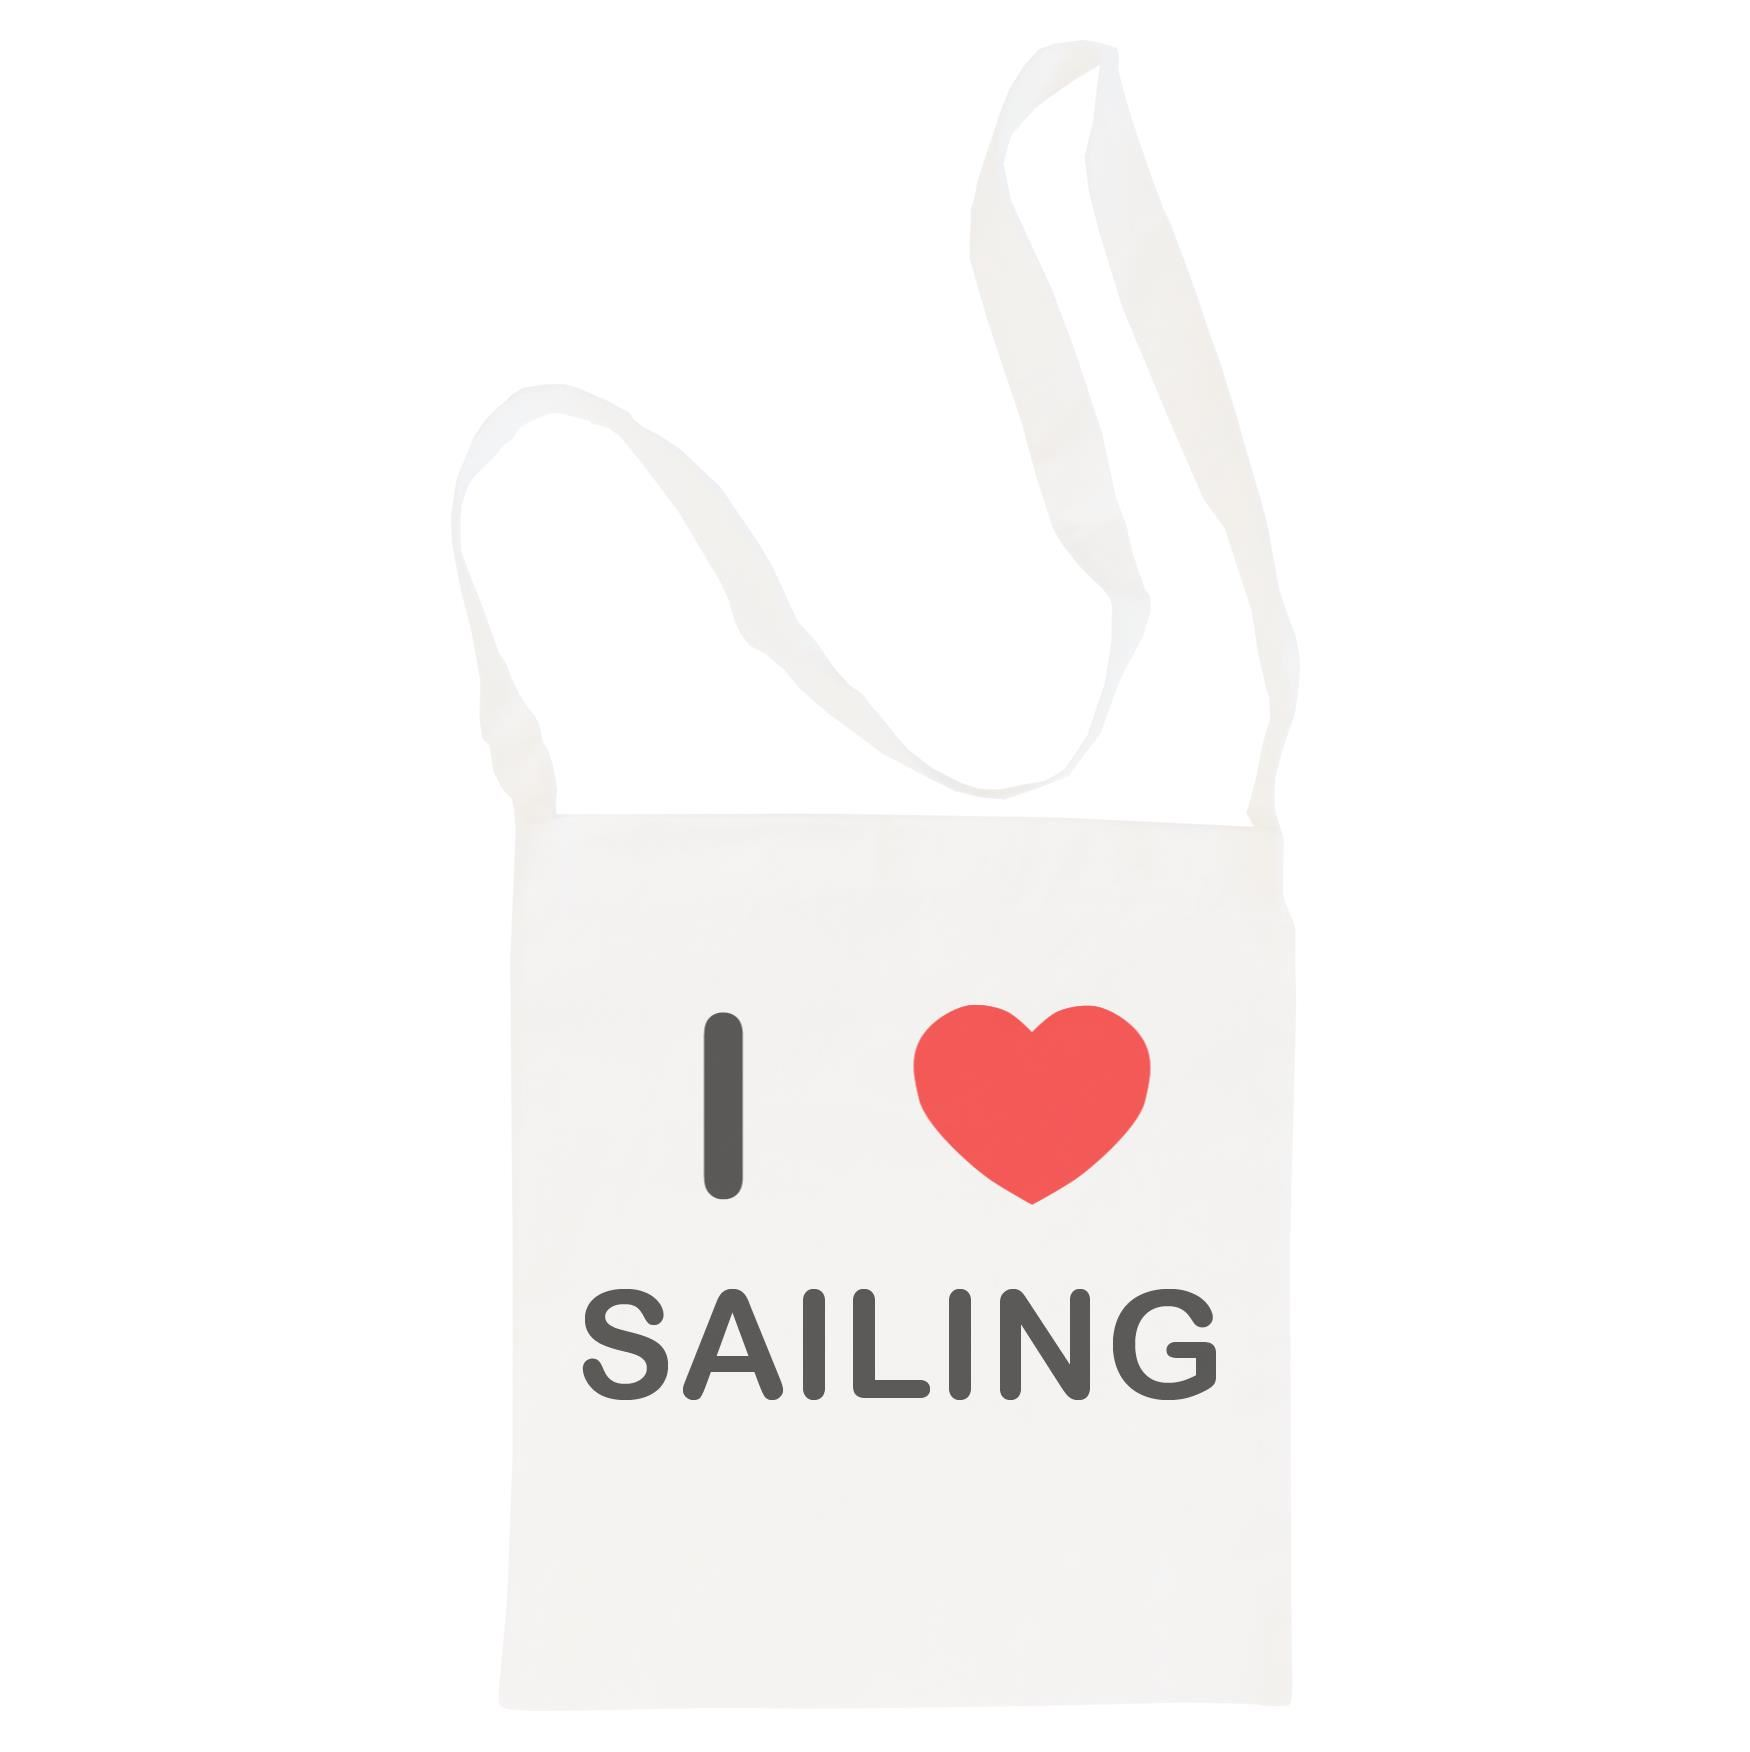 I Love Sailing - Cotton Bag | Size choice Tote, Shopper or Sling